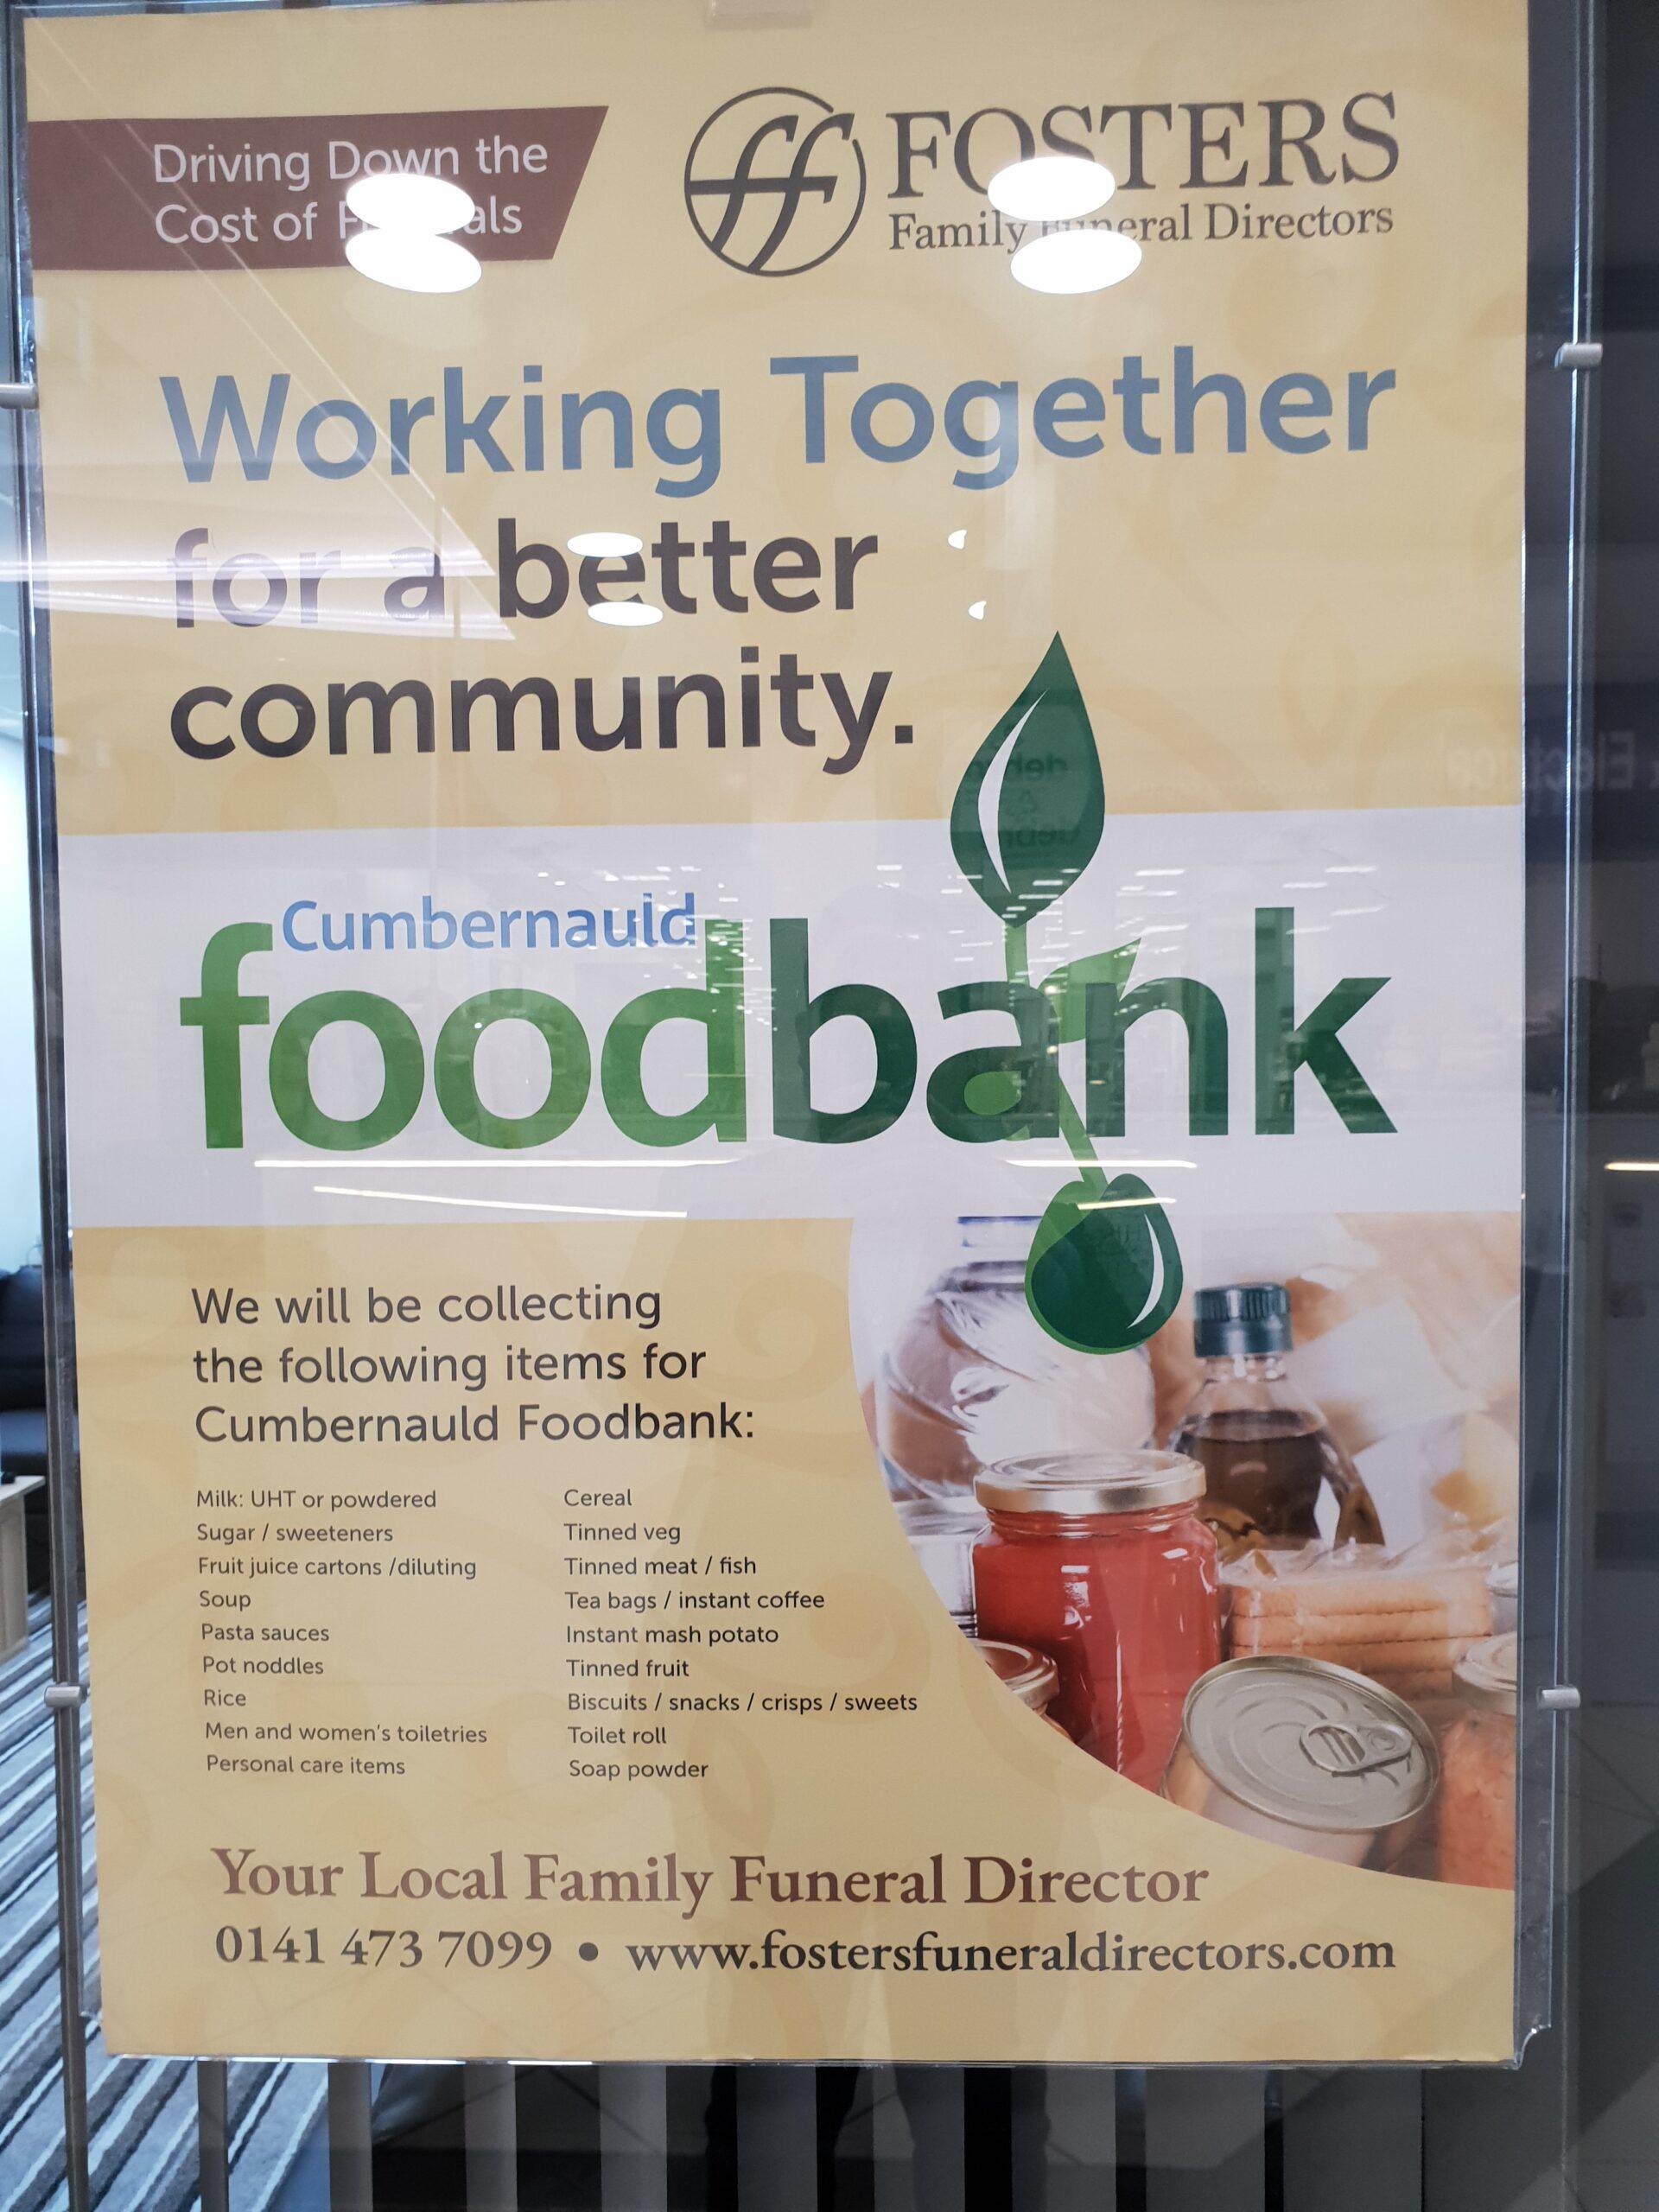 Working in partnership with Cumbernauld Foodbank